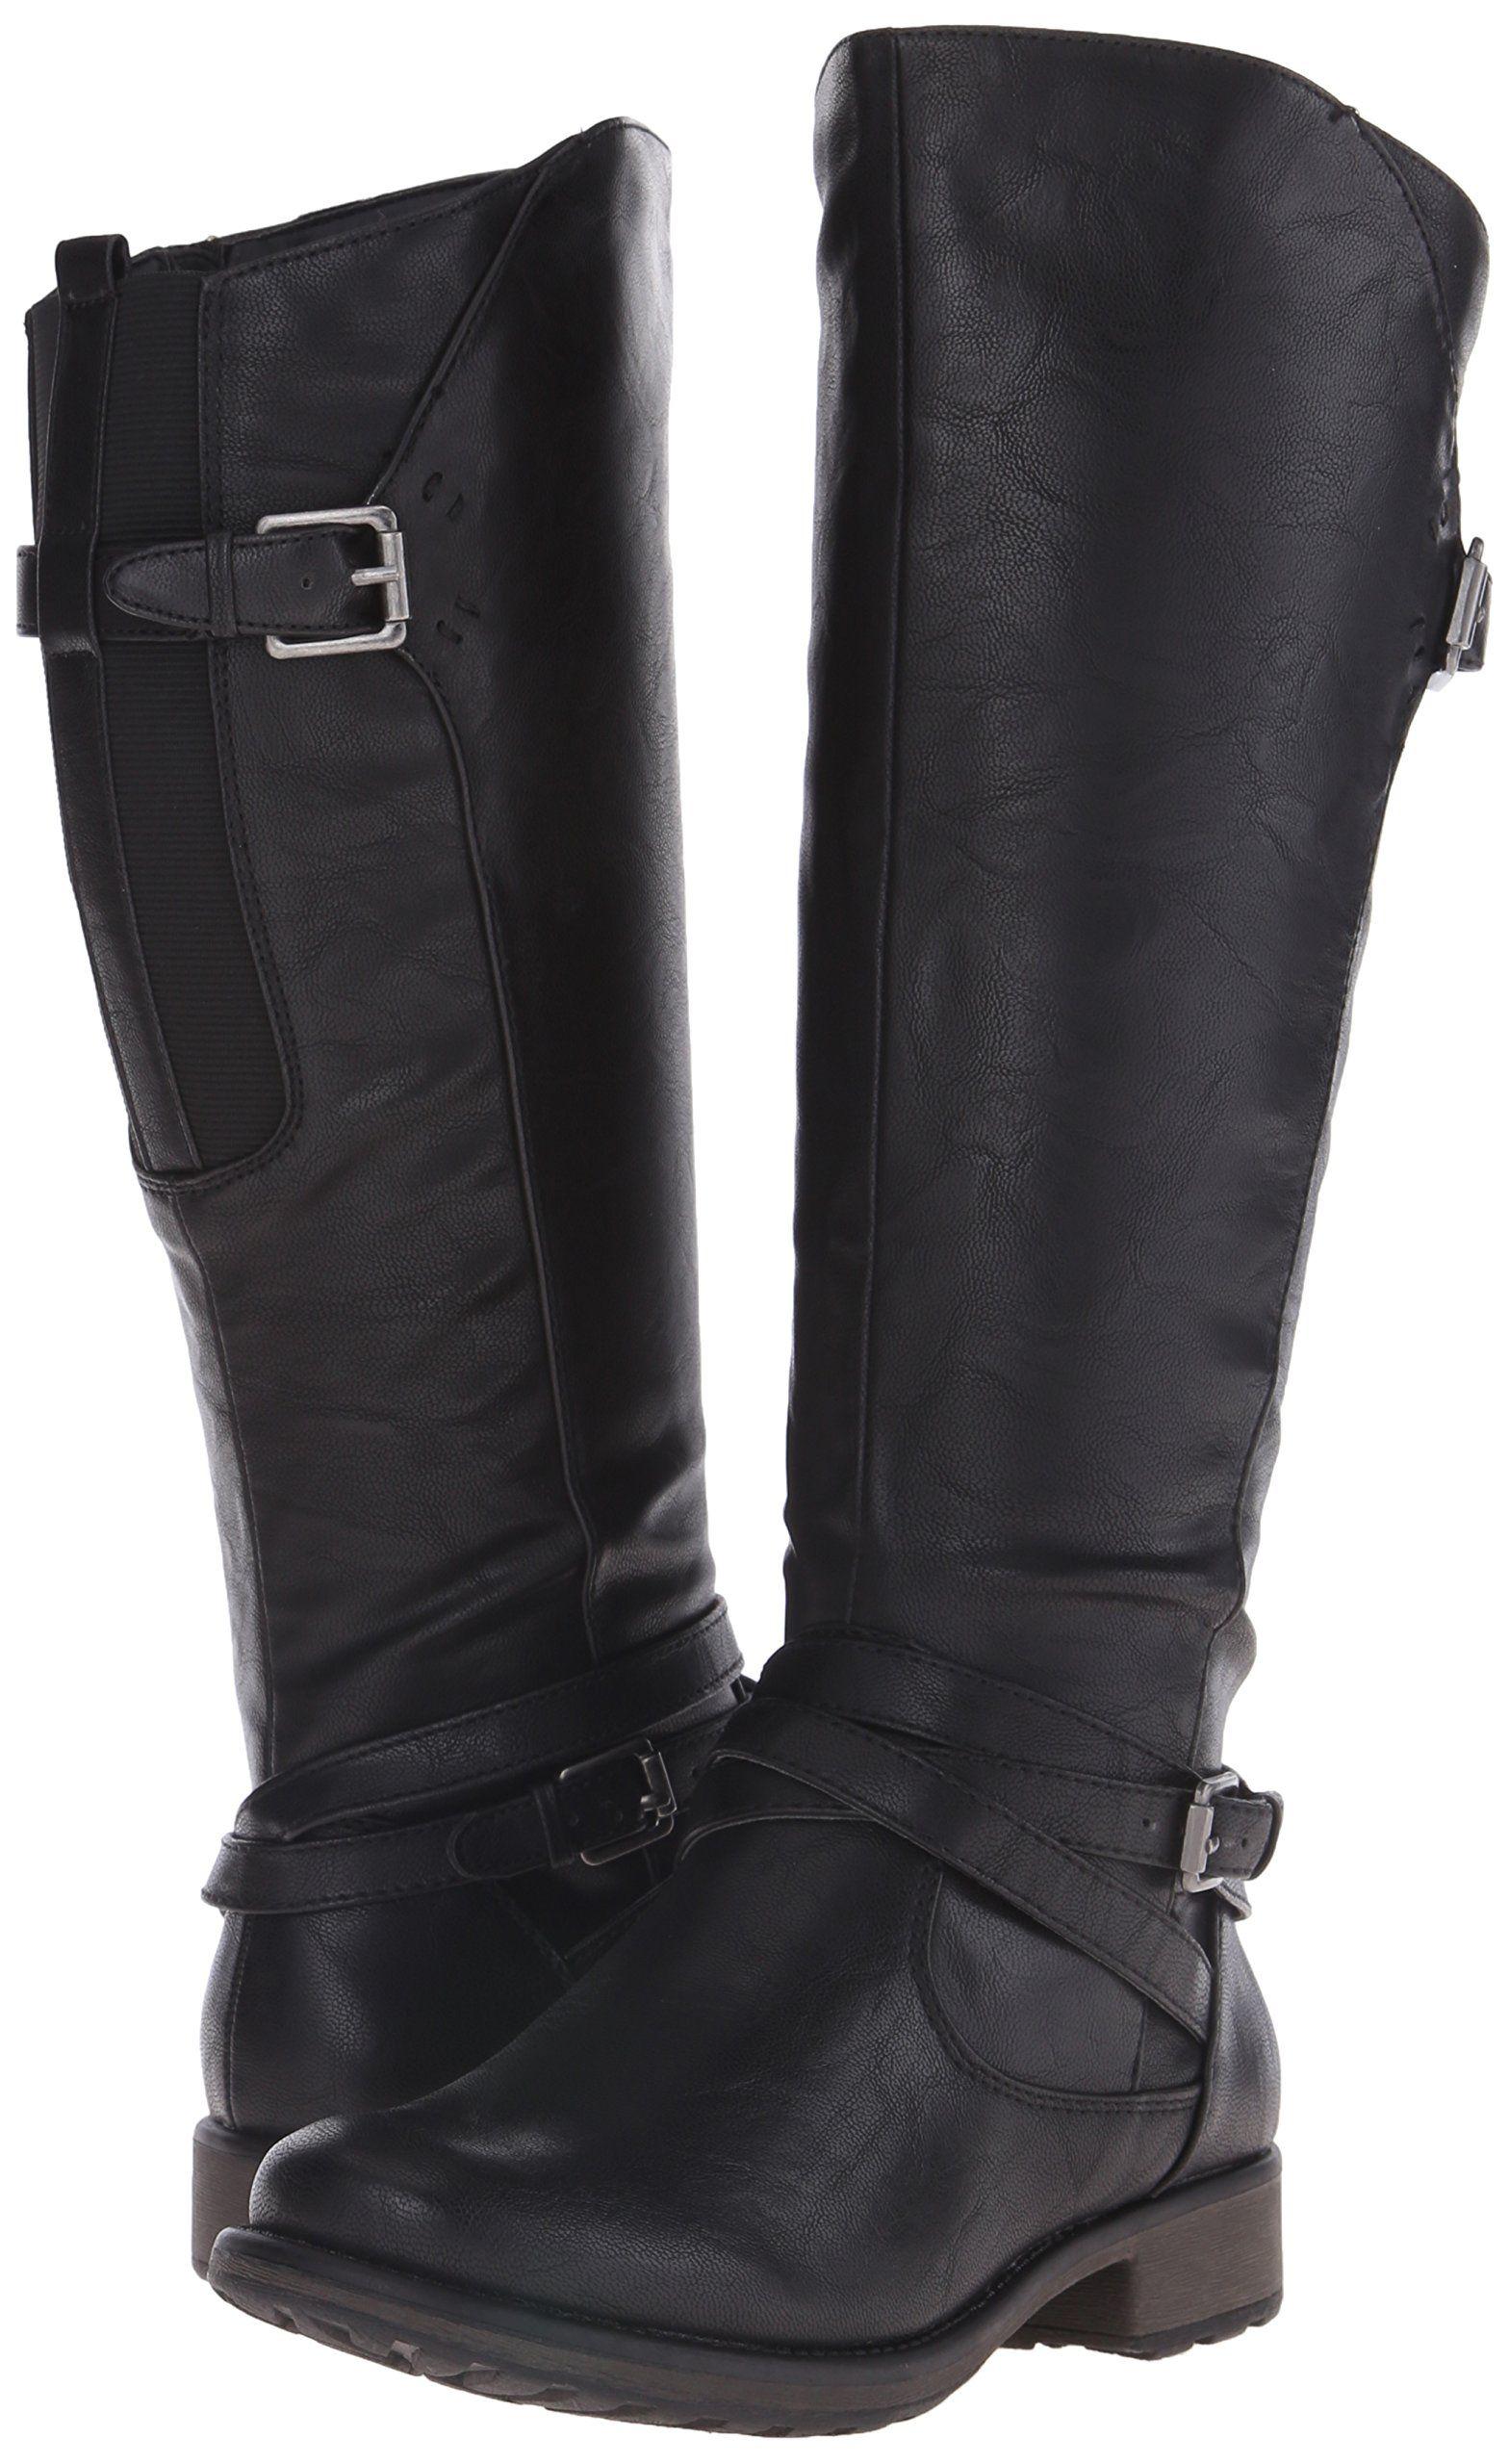 BareTraps Women's Susanna Riding Boot, Black